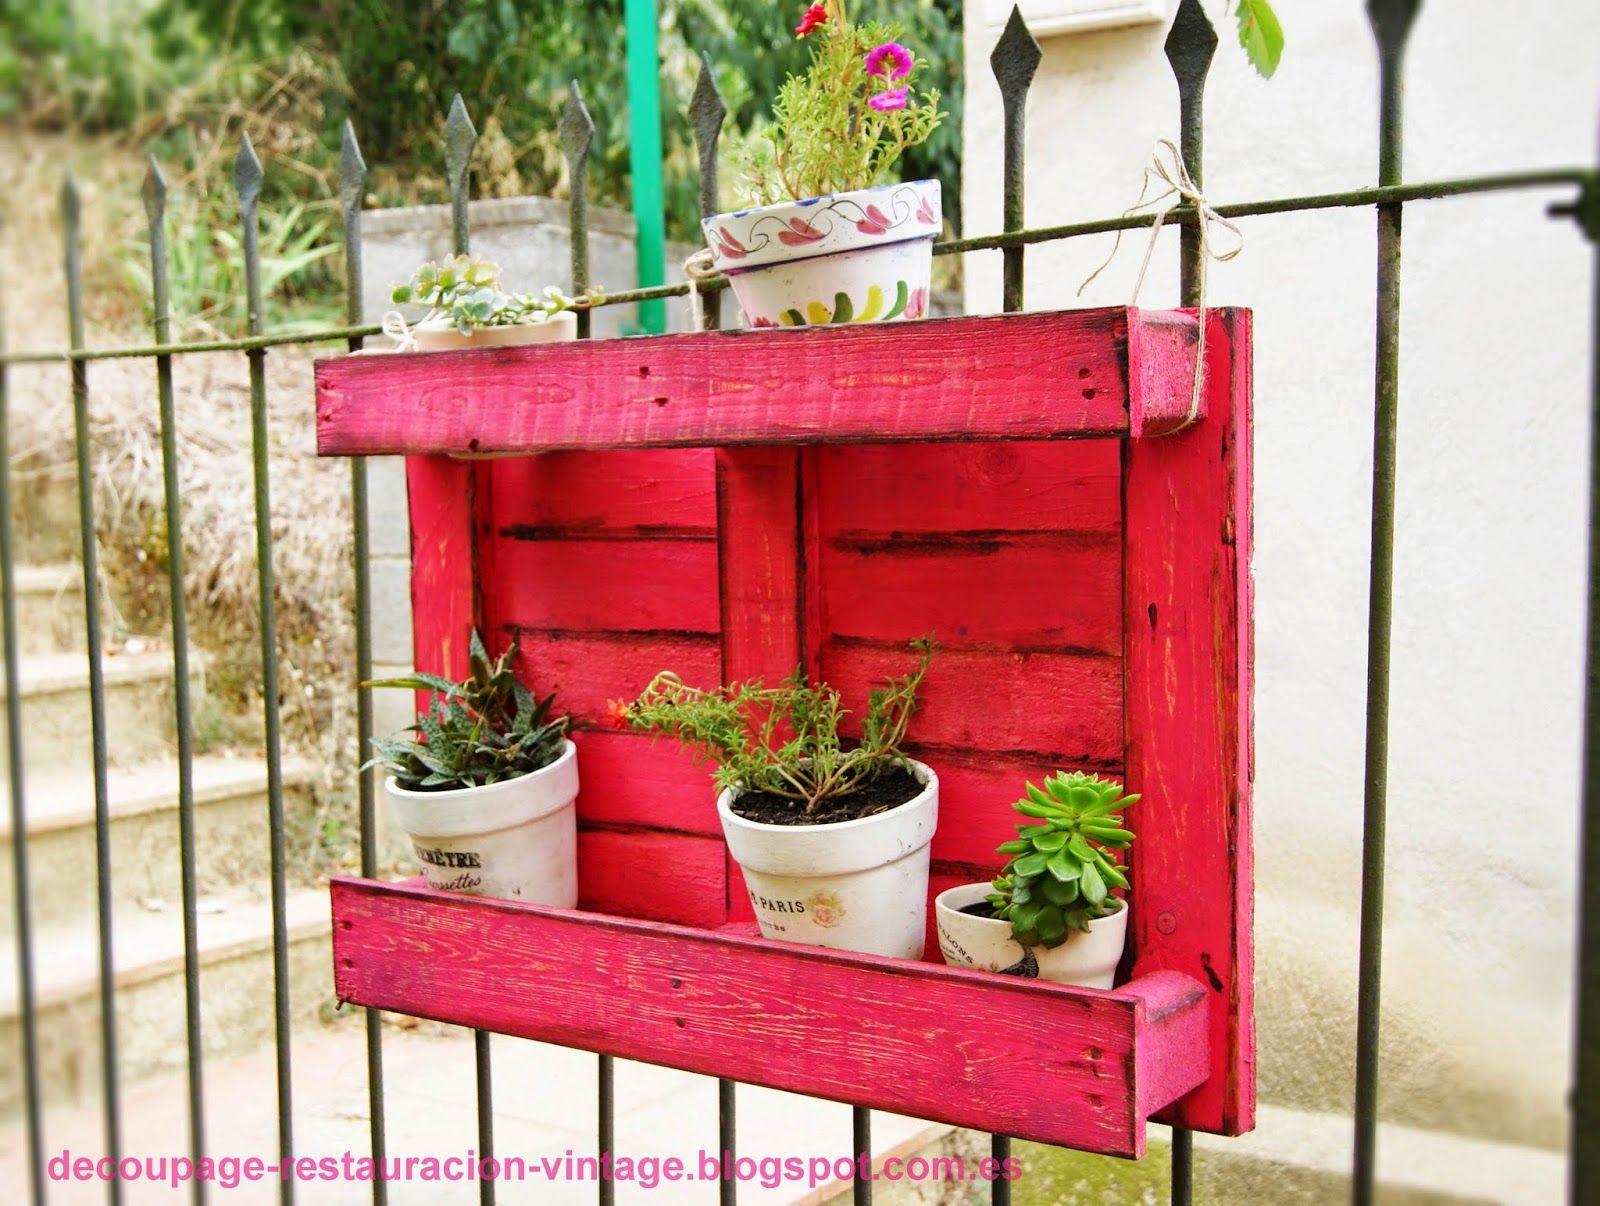 palets #jardín #ideas #pallet | Ideas con palets para jardín ...